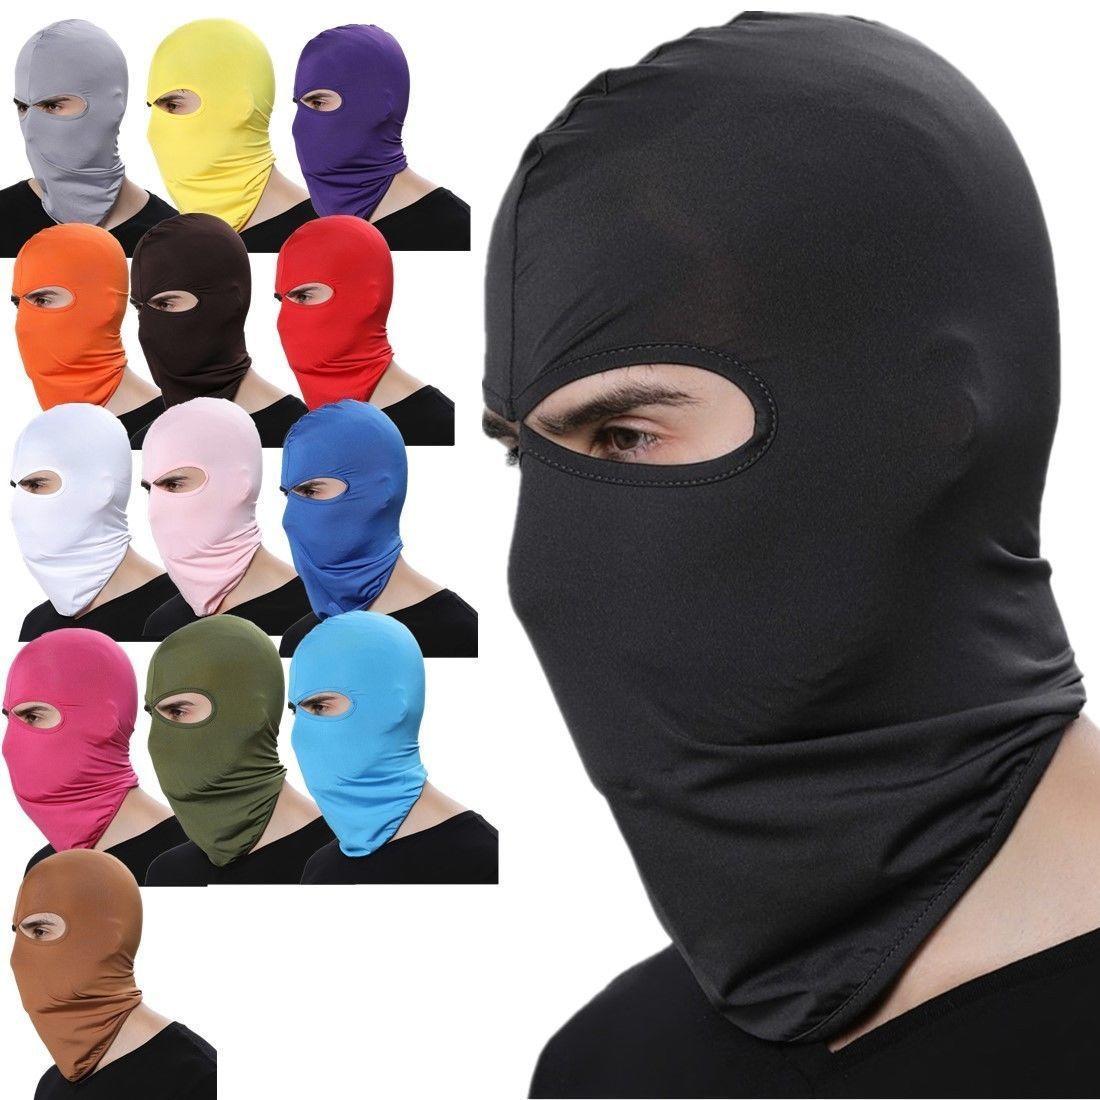 2019 Outdoor Balaclavas Sports Neck Face Mask Ski Snowboard Wind Cap Police  Cycling Balaclavas Motorcycle Face Masks GGA722 From Shuaijinjin china 5c7b5d099